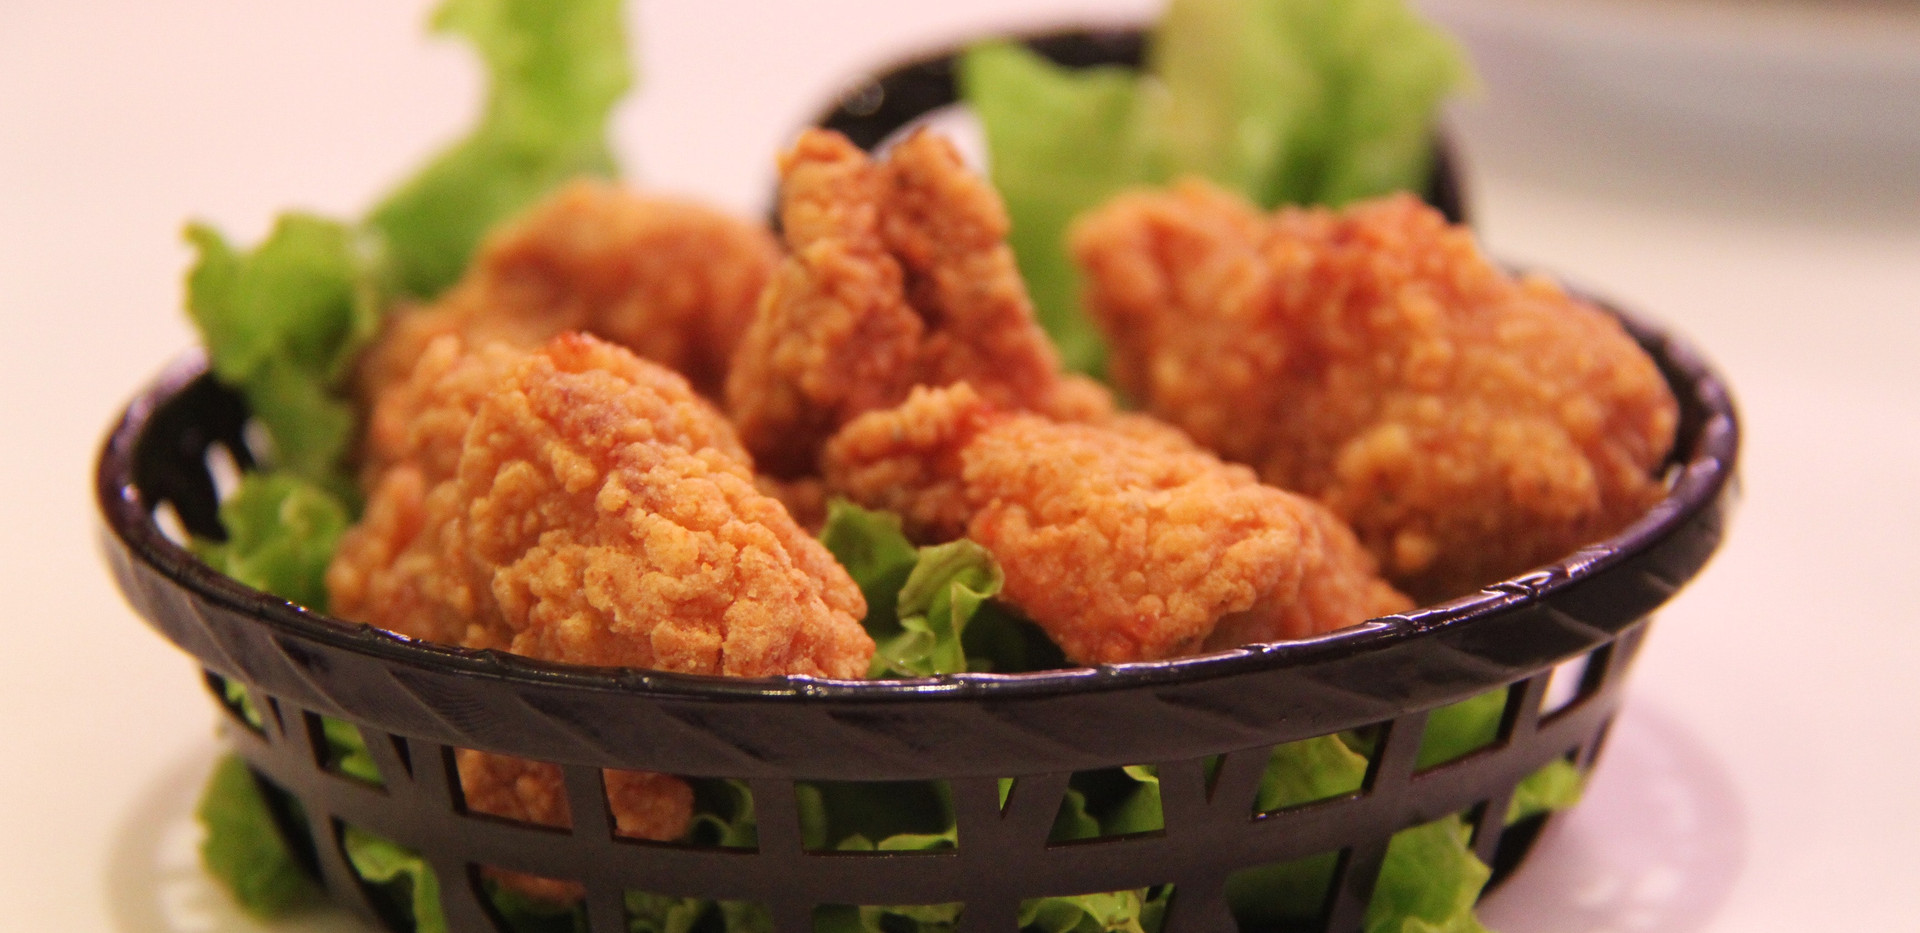 chicken-close-up-crispy-60616.jpg